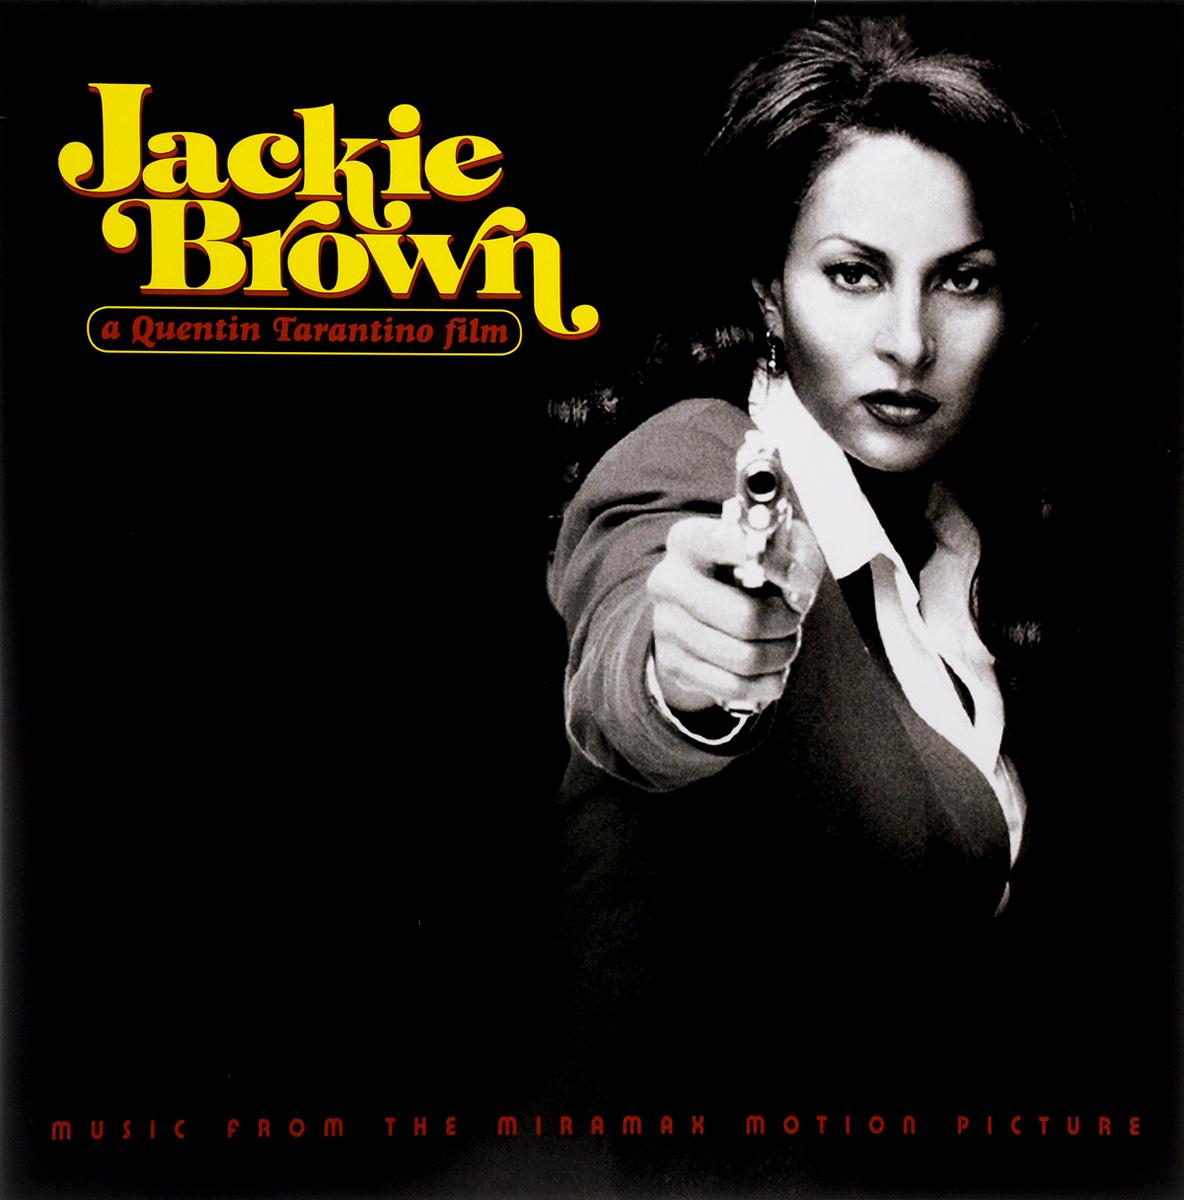 Бобби Уомак,The Brothers Johnson,Билл Уизерс,Джонни Кэш,Bloodstone,Пэм Грайер,Фокси Браун,Рэнди Кроуфорд,The Delfonics,The Grass Roots Jackie Brown. Music From The Miramax Motion Picture (LP) бобби браун bobby brown the definitive collection